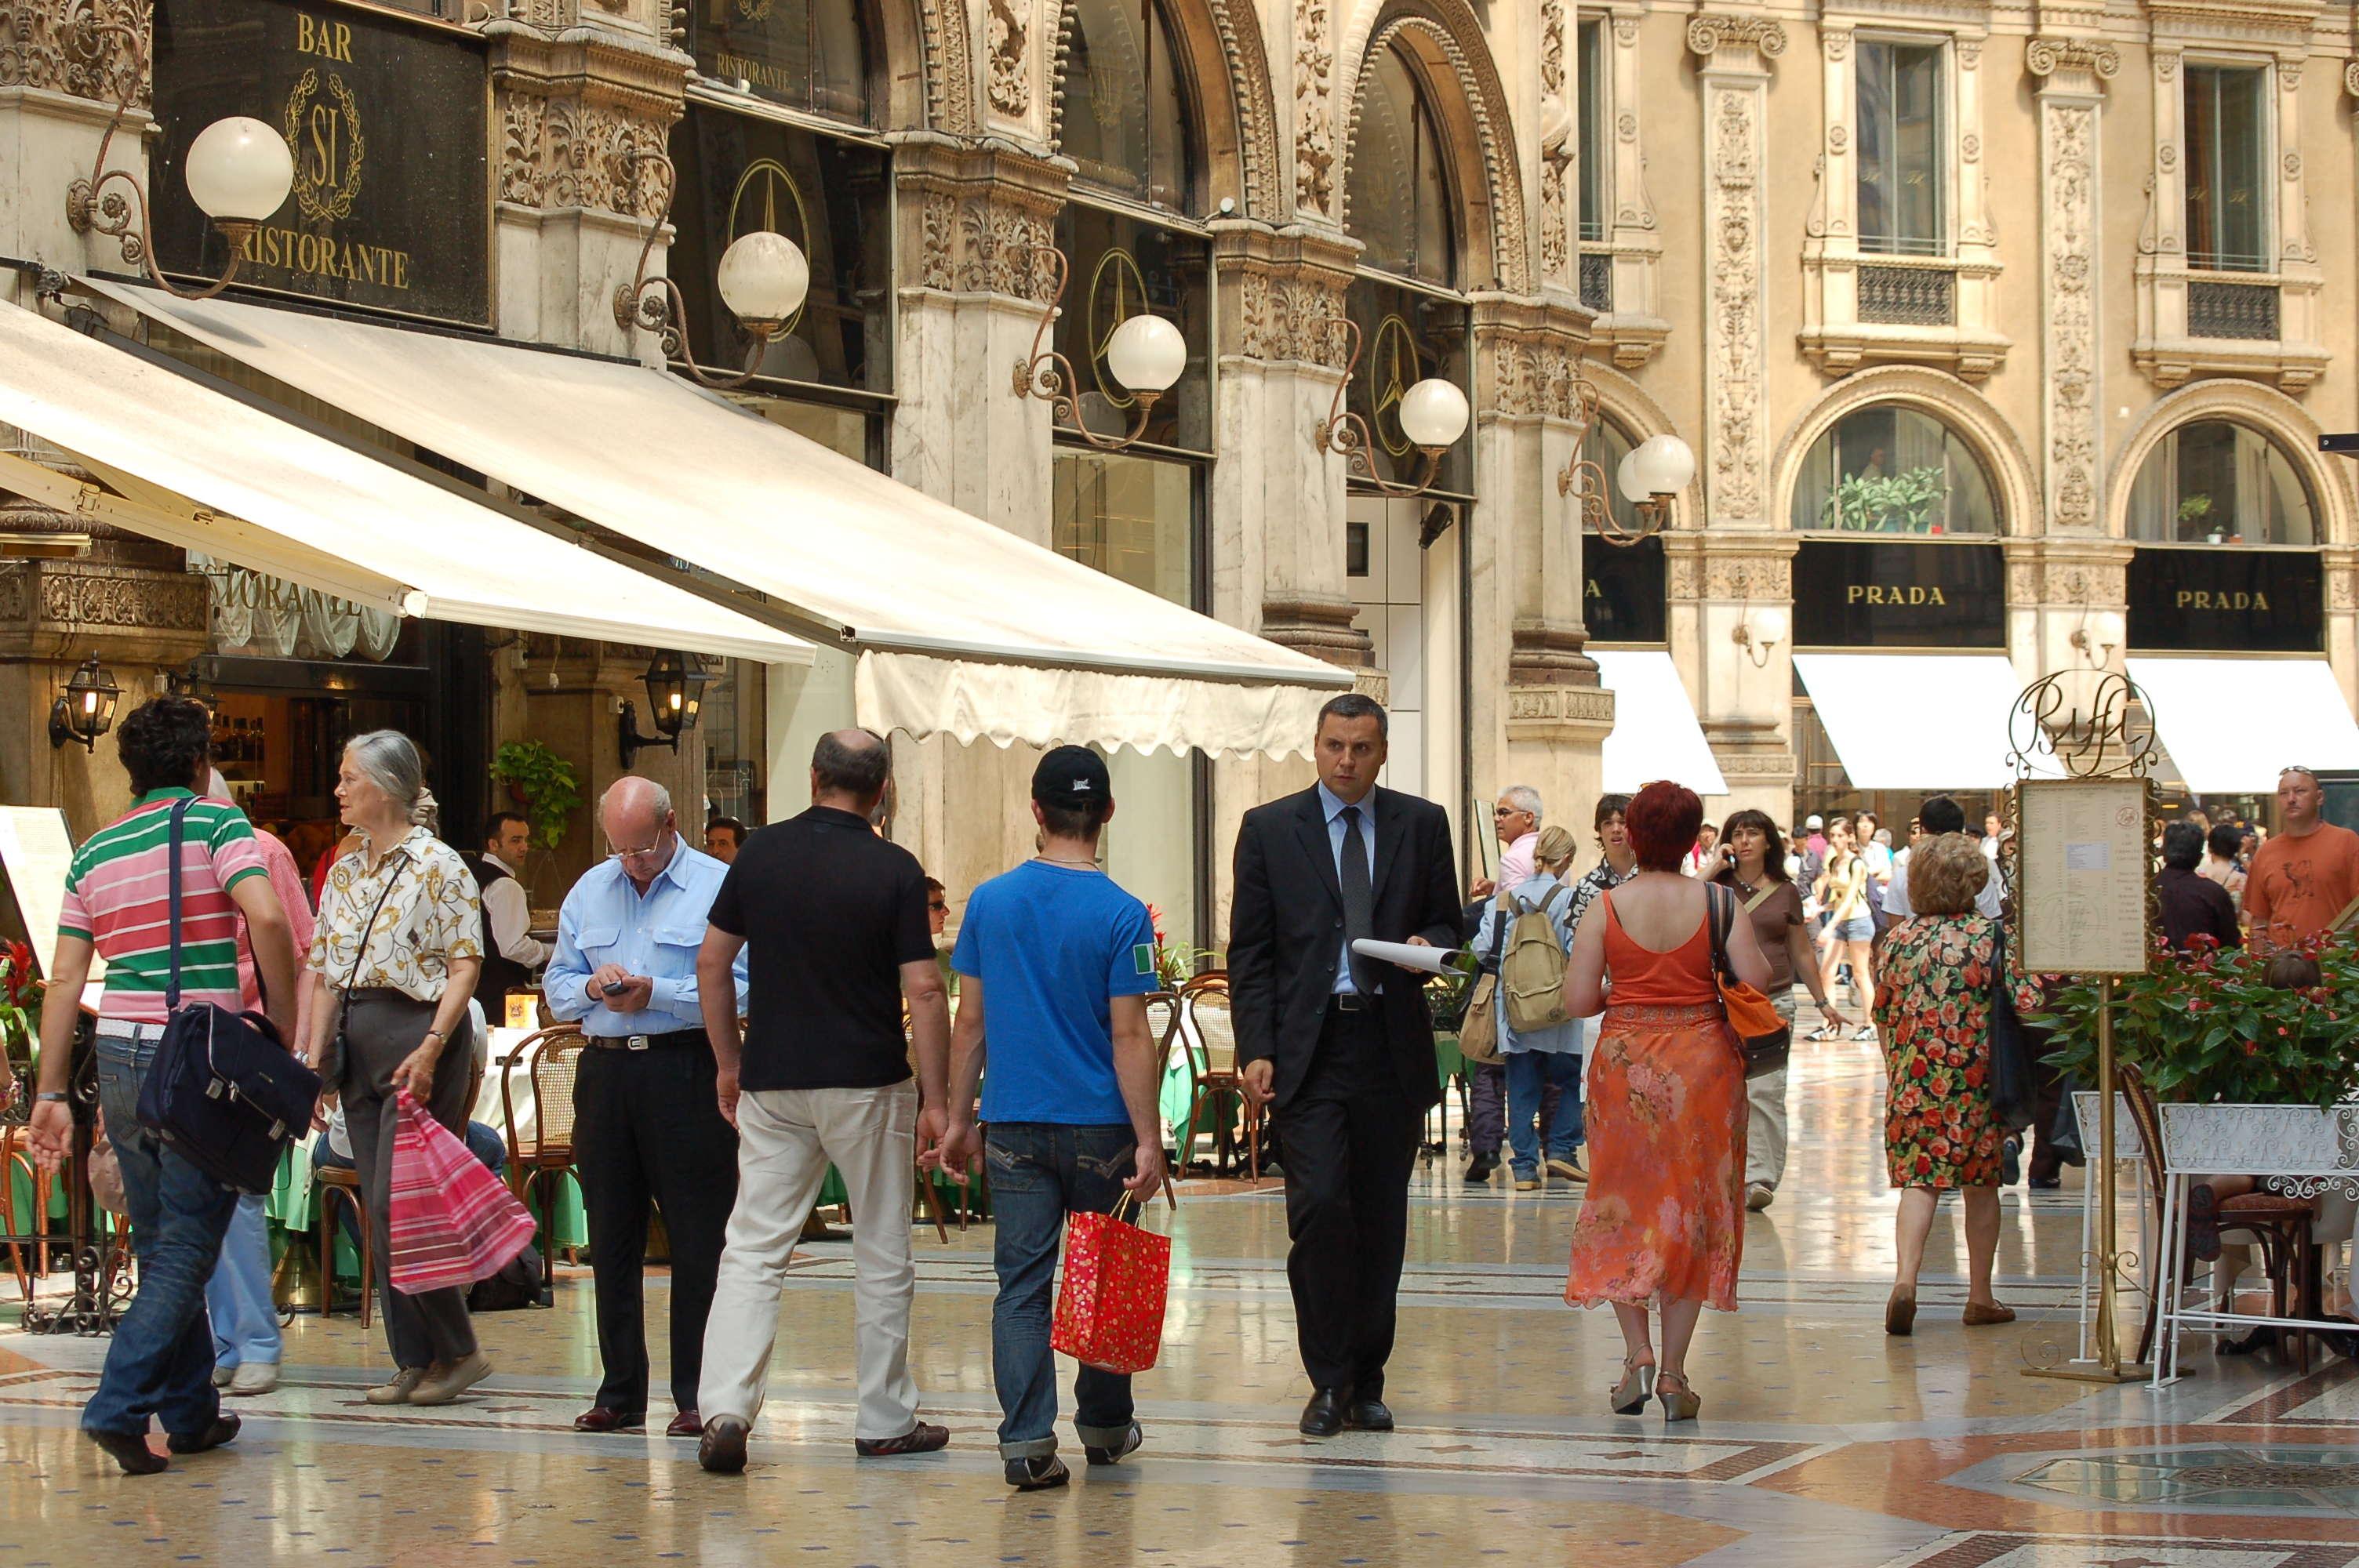 Galleria and Corso Vittorio Emanuele II